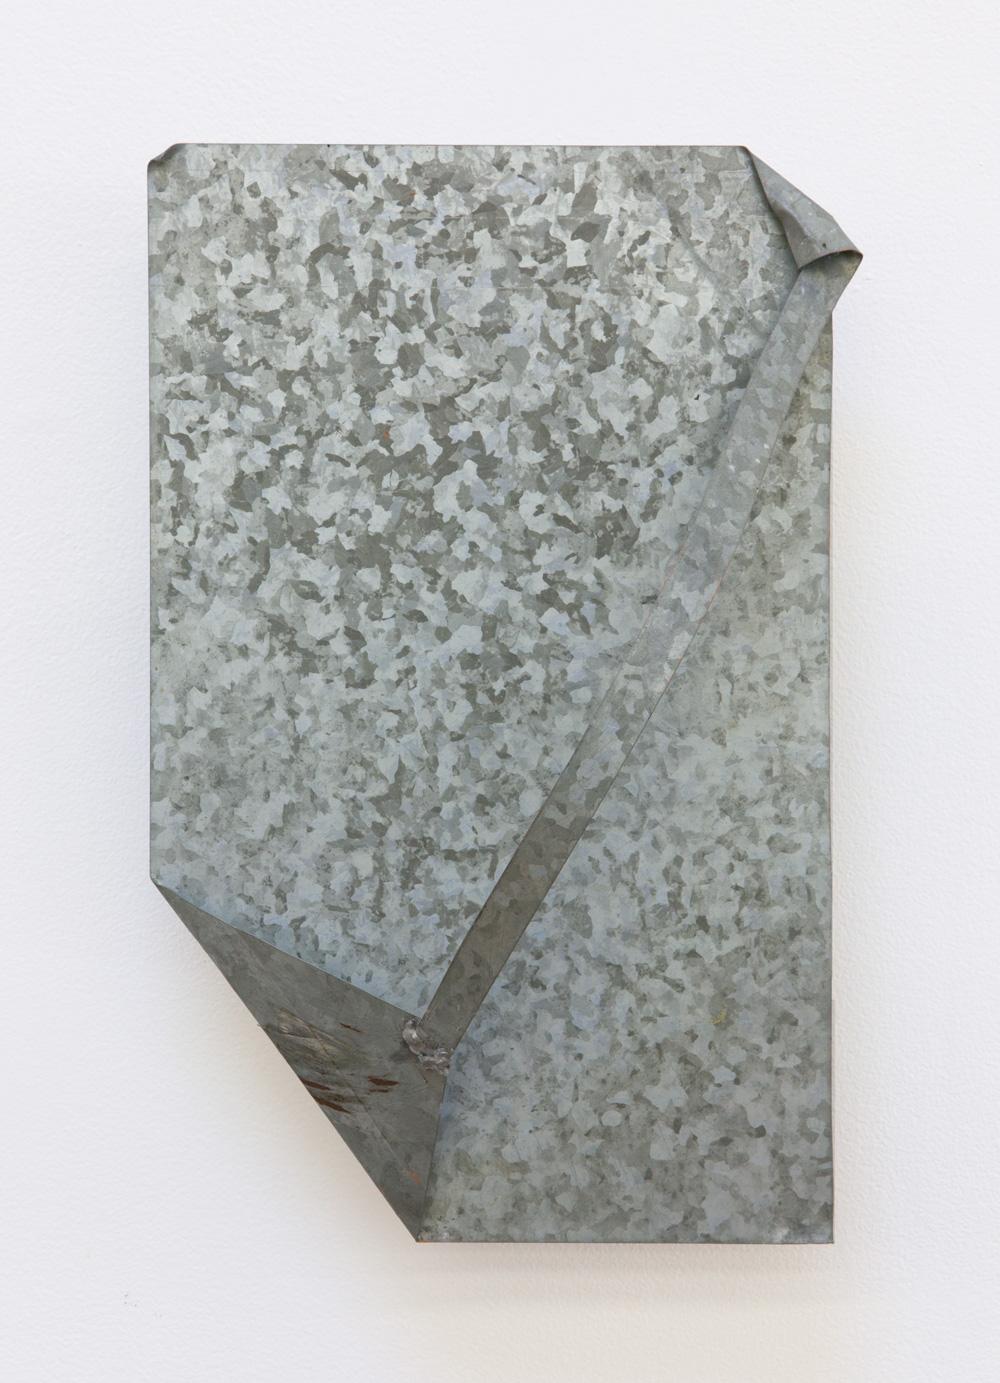 Edge and Corner—Surrounding , 2004 辺と角—連周 ( Hen to kado—Renshū ) Zinc plate 11 7/8 x 7 1/4 x 4 7/8 inches 30 x 18.5 x 12.5 cm